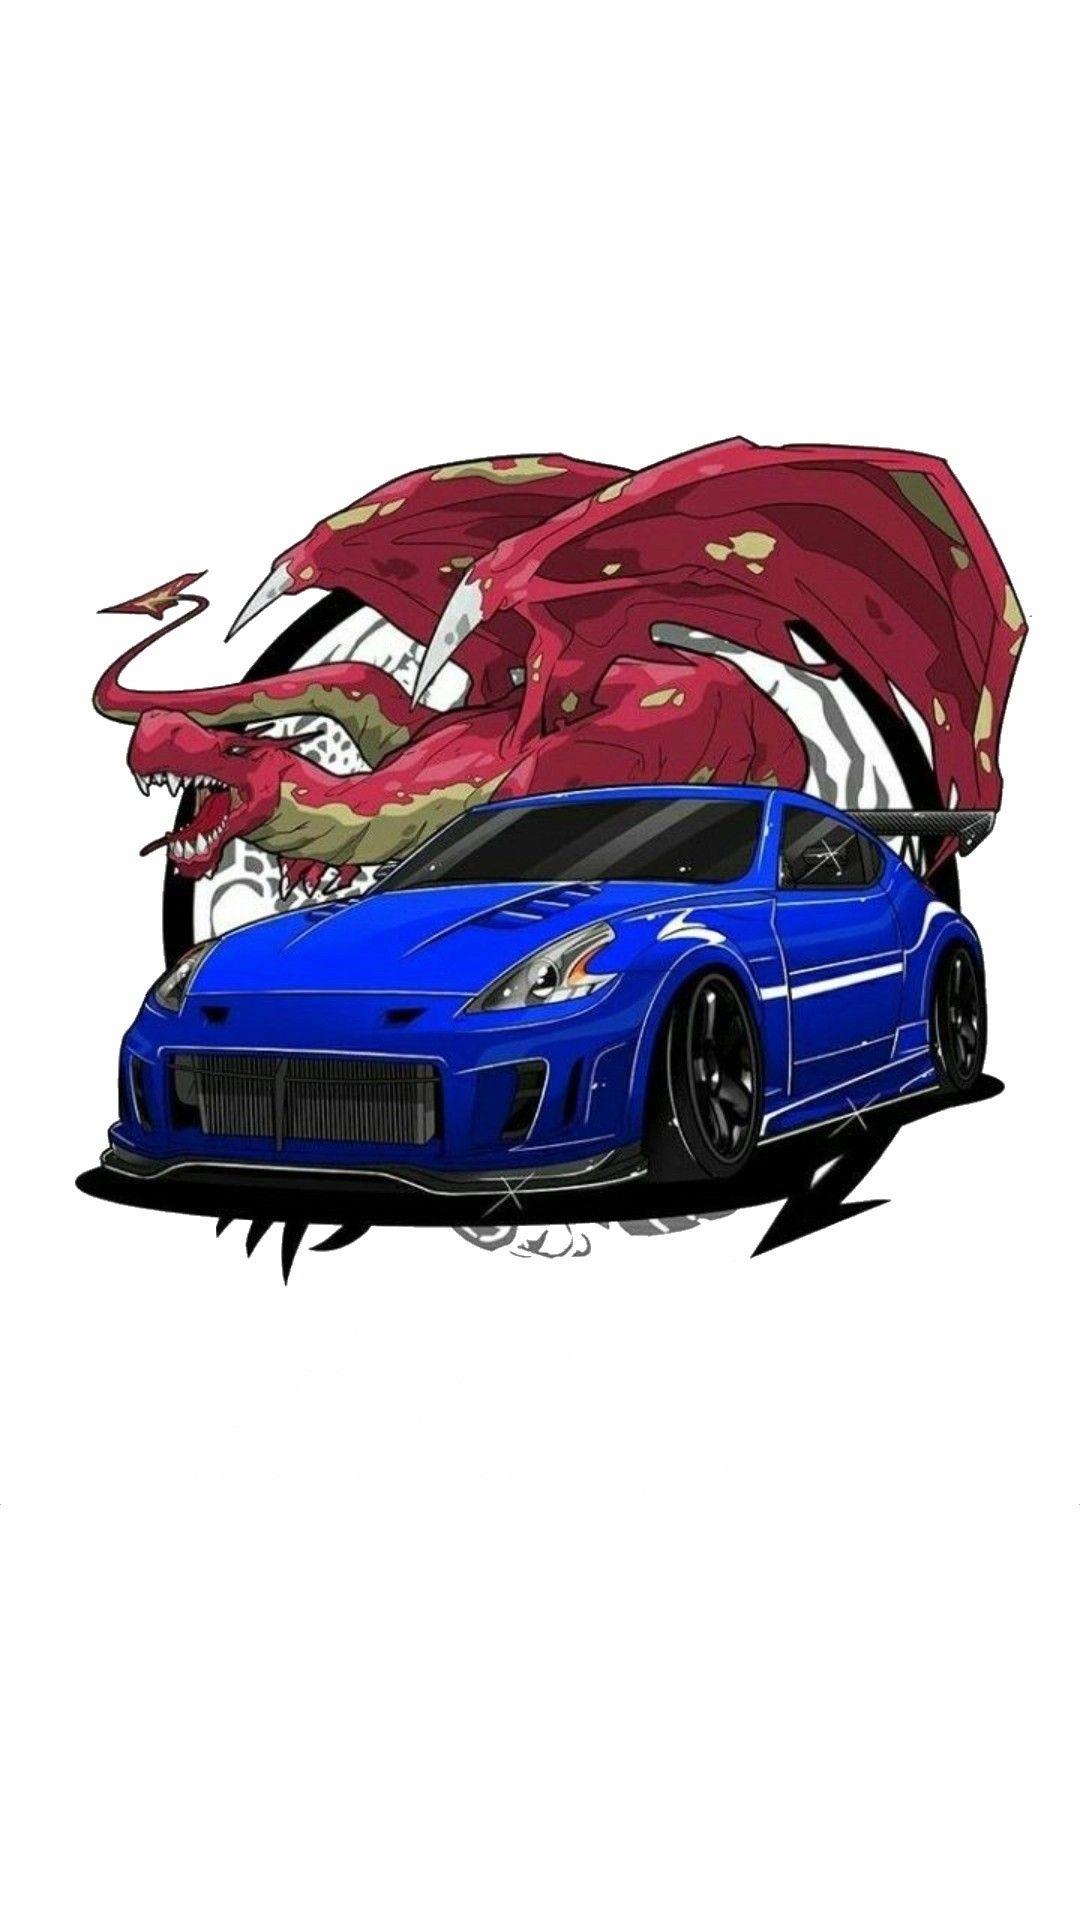 Pin By Frank Davila On Cars Toons Art Cars Car Drawings Japanese Sports Cars